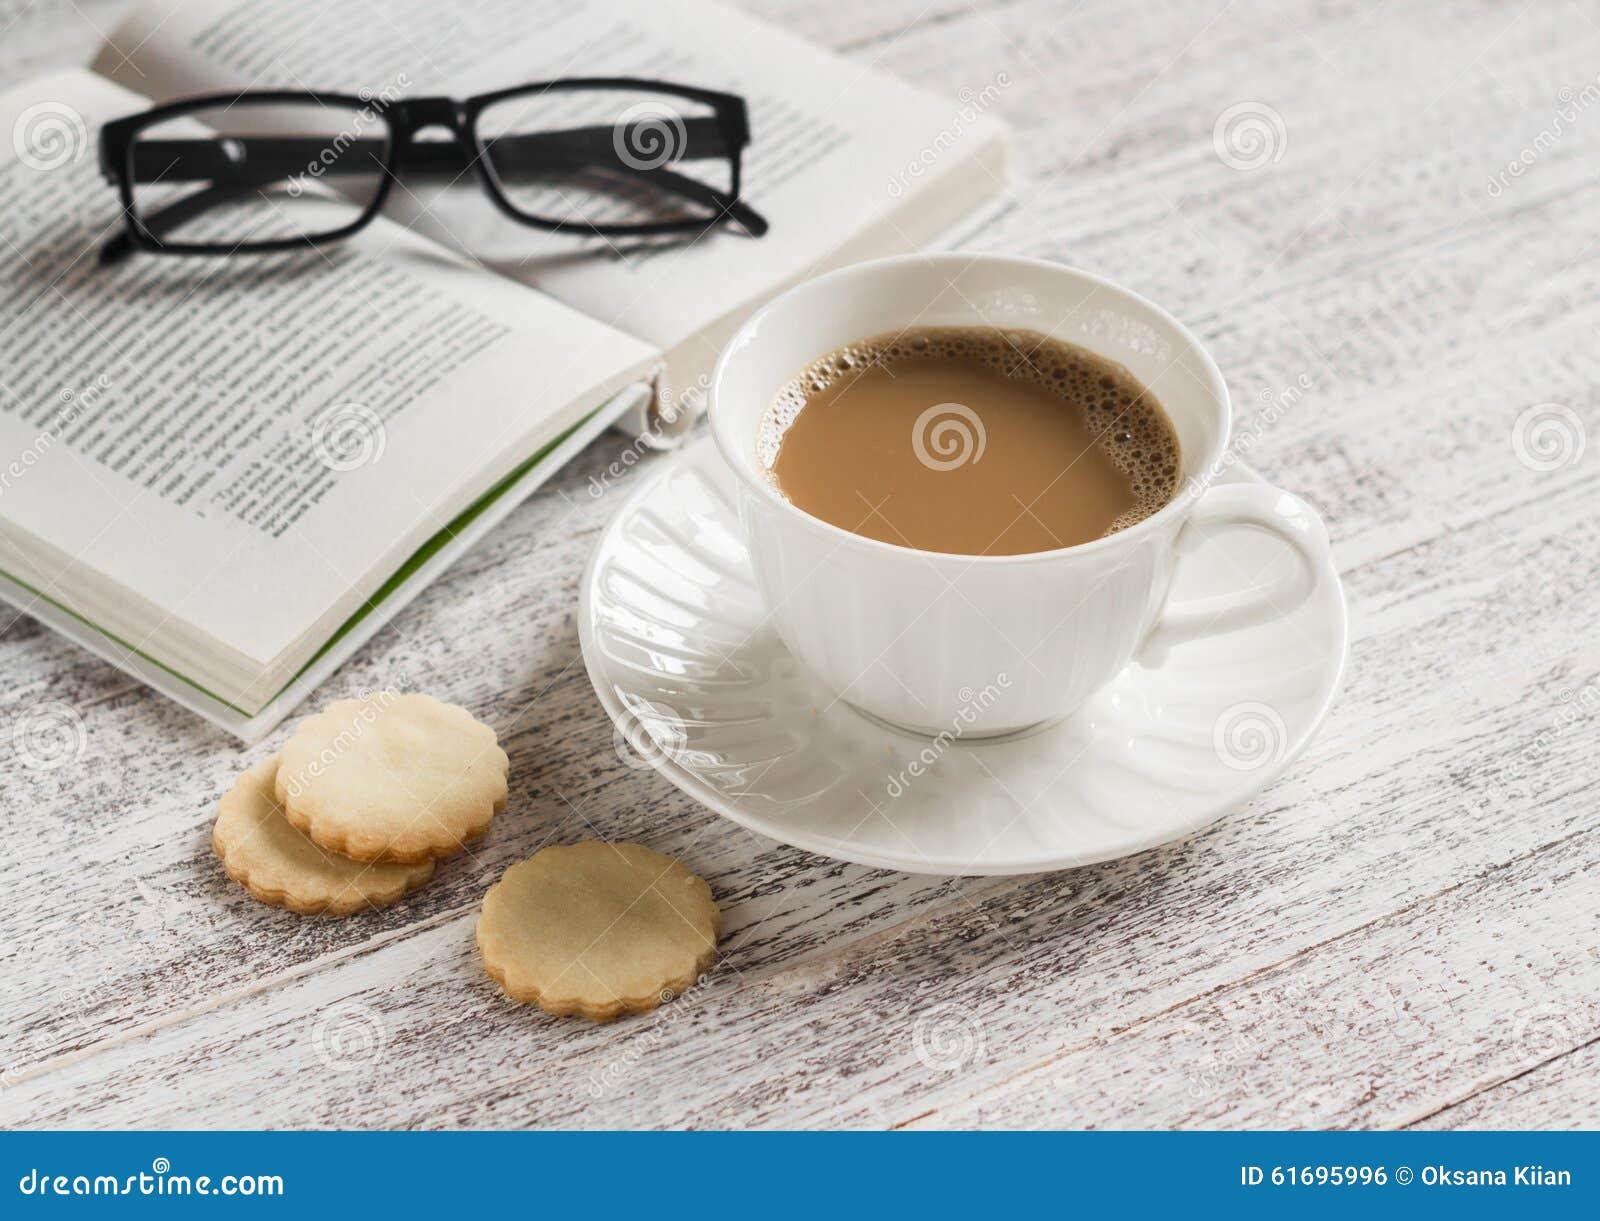 Open A Blank White Notebook 0205b4348